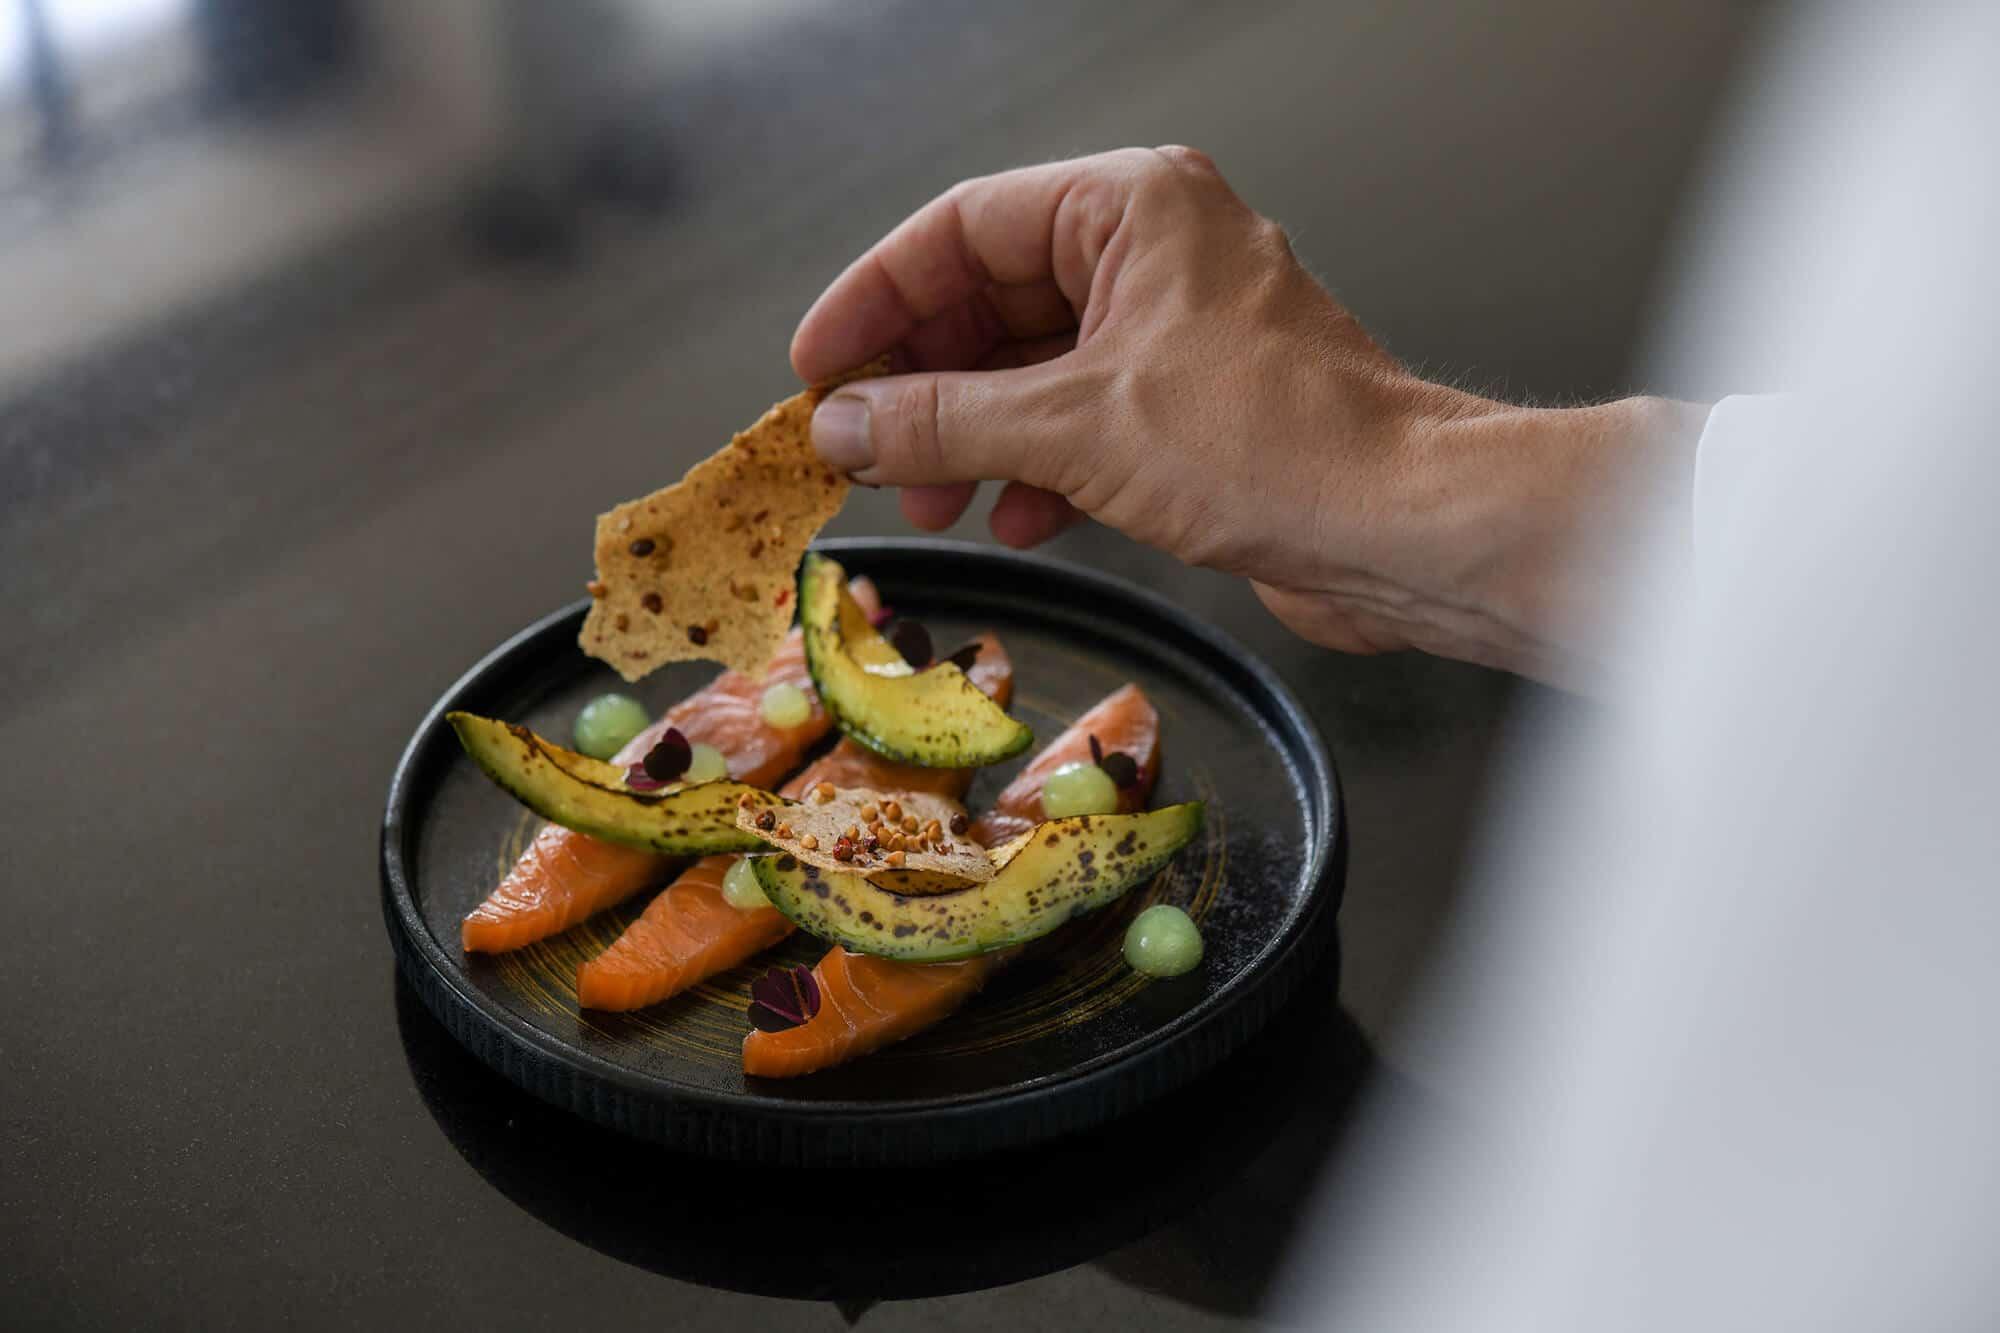 hotel molitor brasserie urbaine paris chef martin simolka food